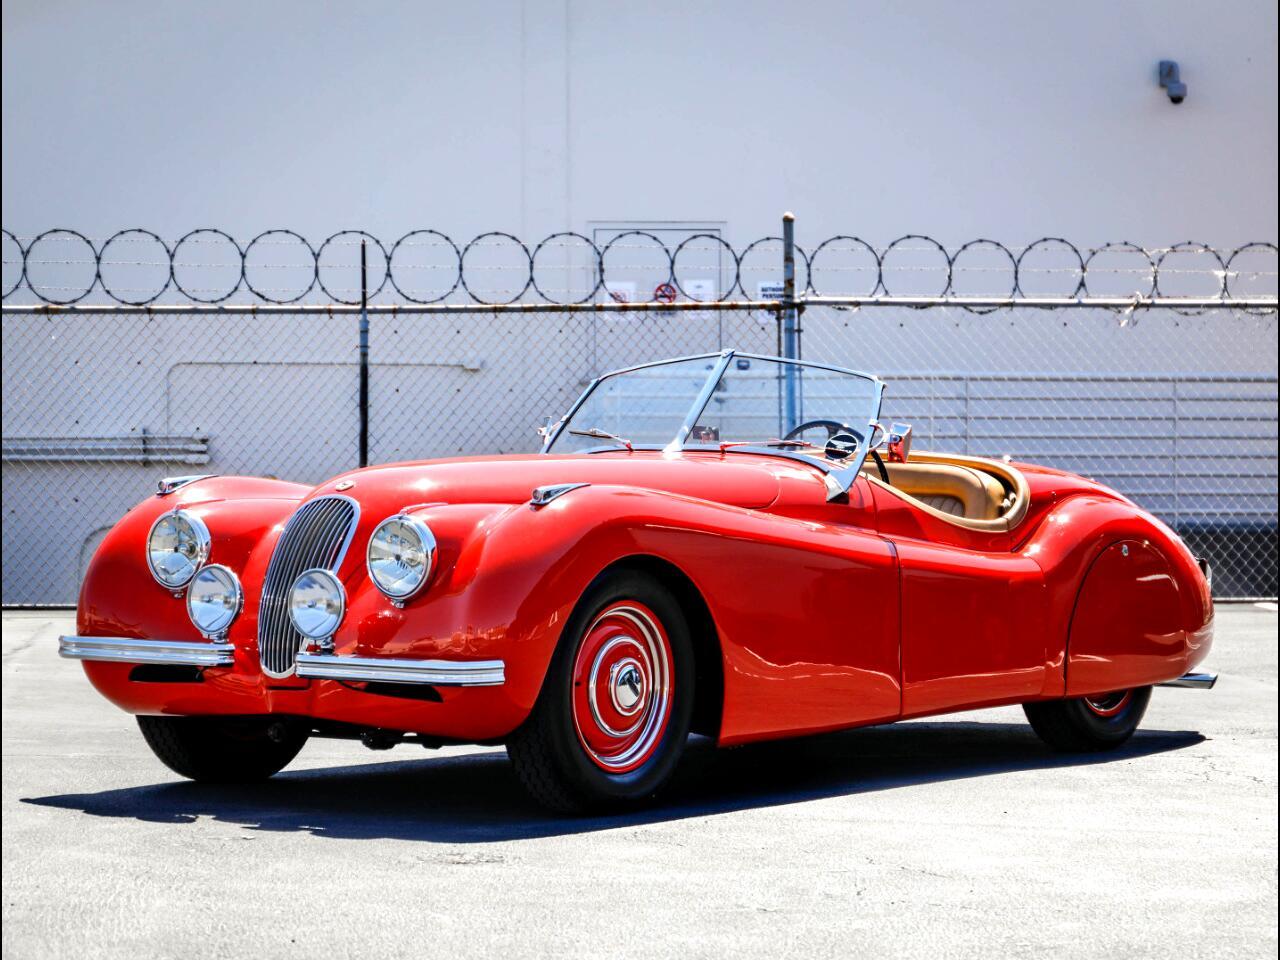 1950 Jaguar XK 120 Alloy